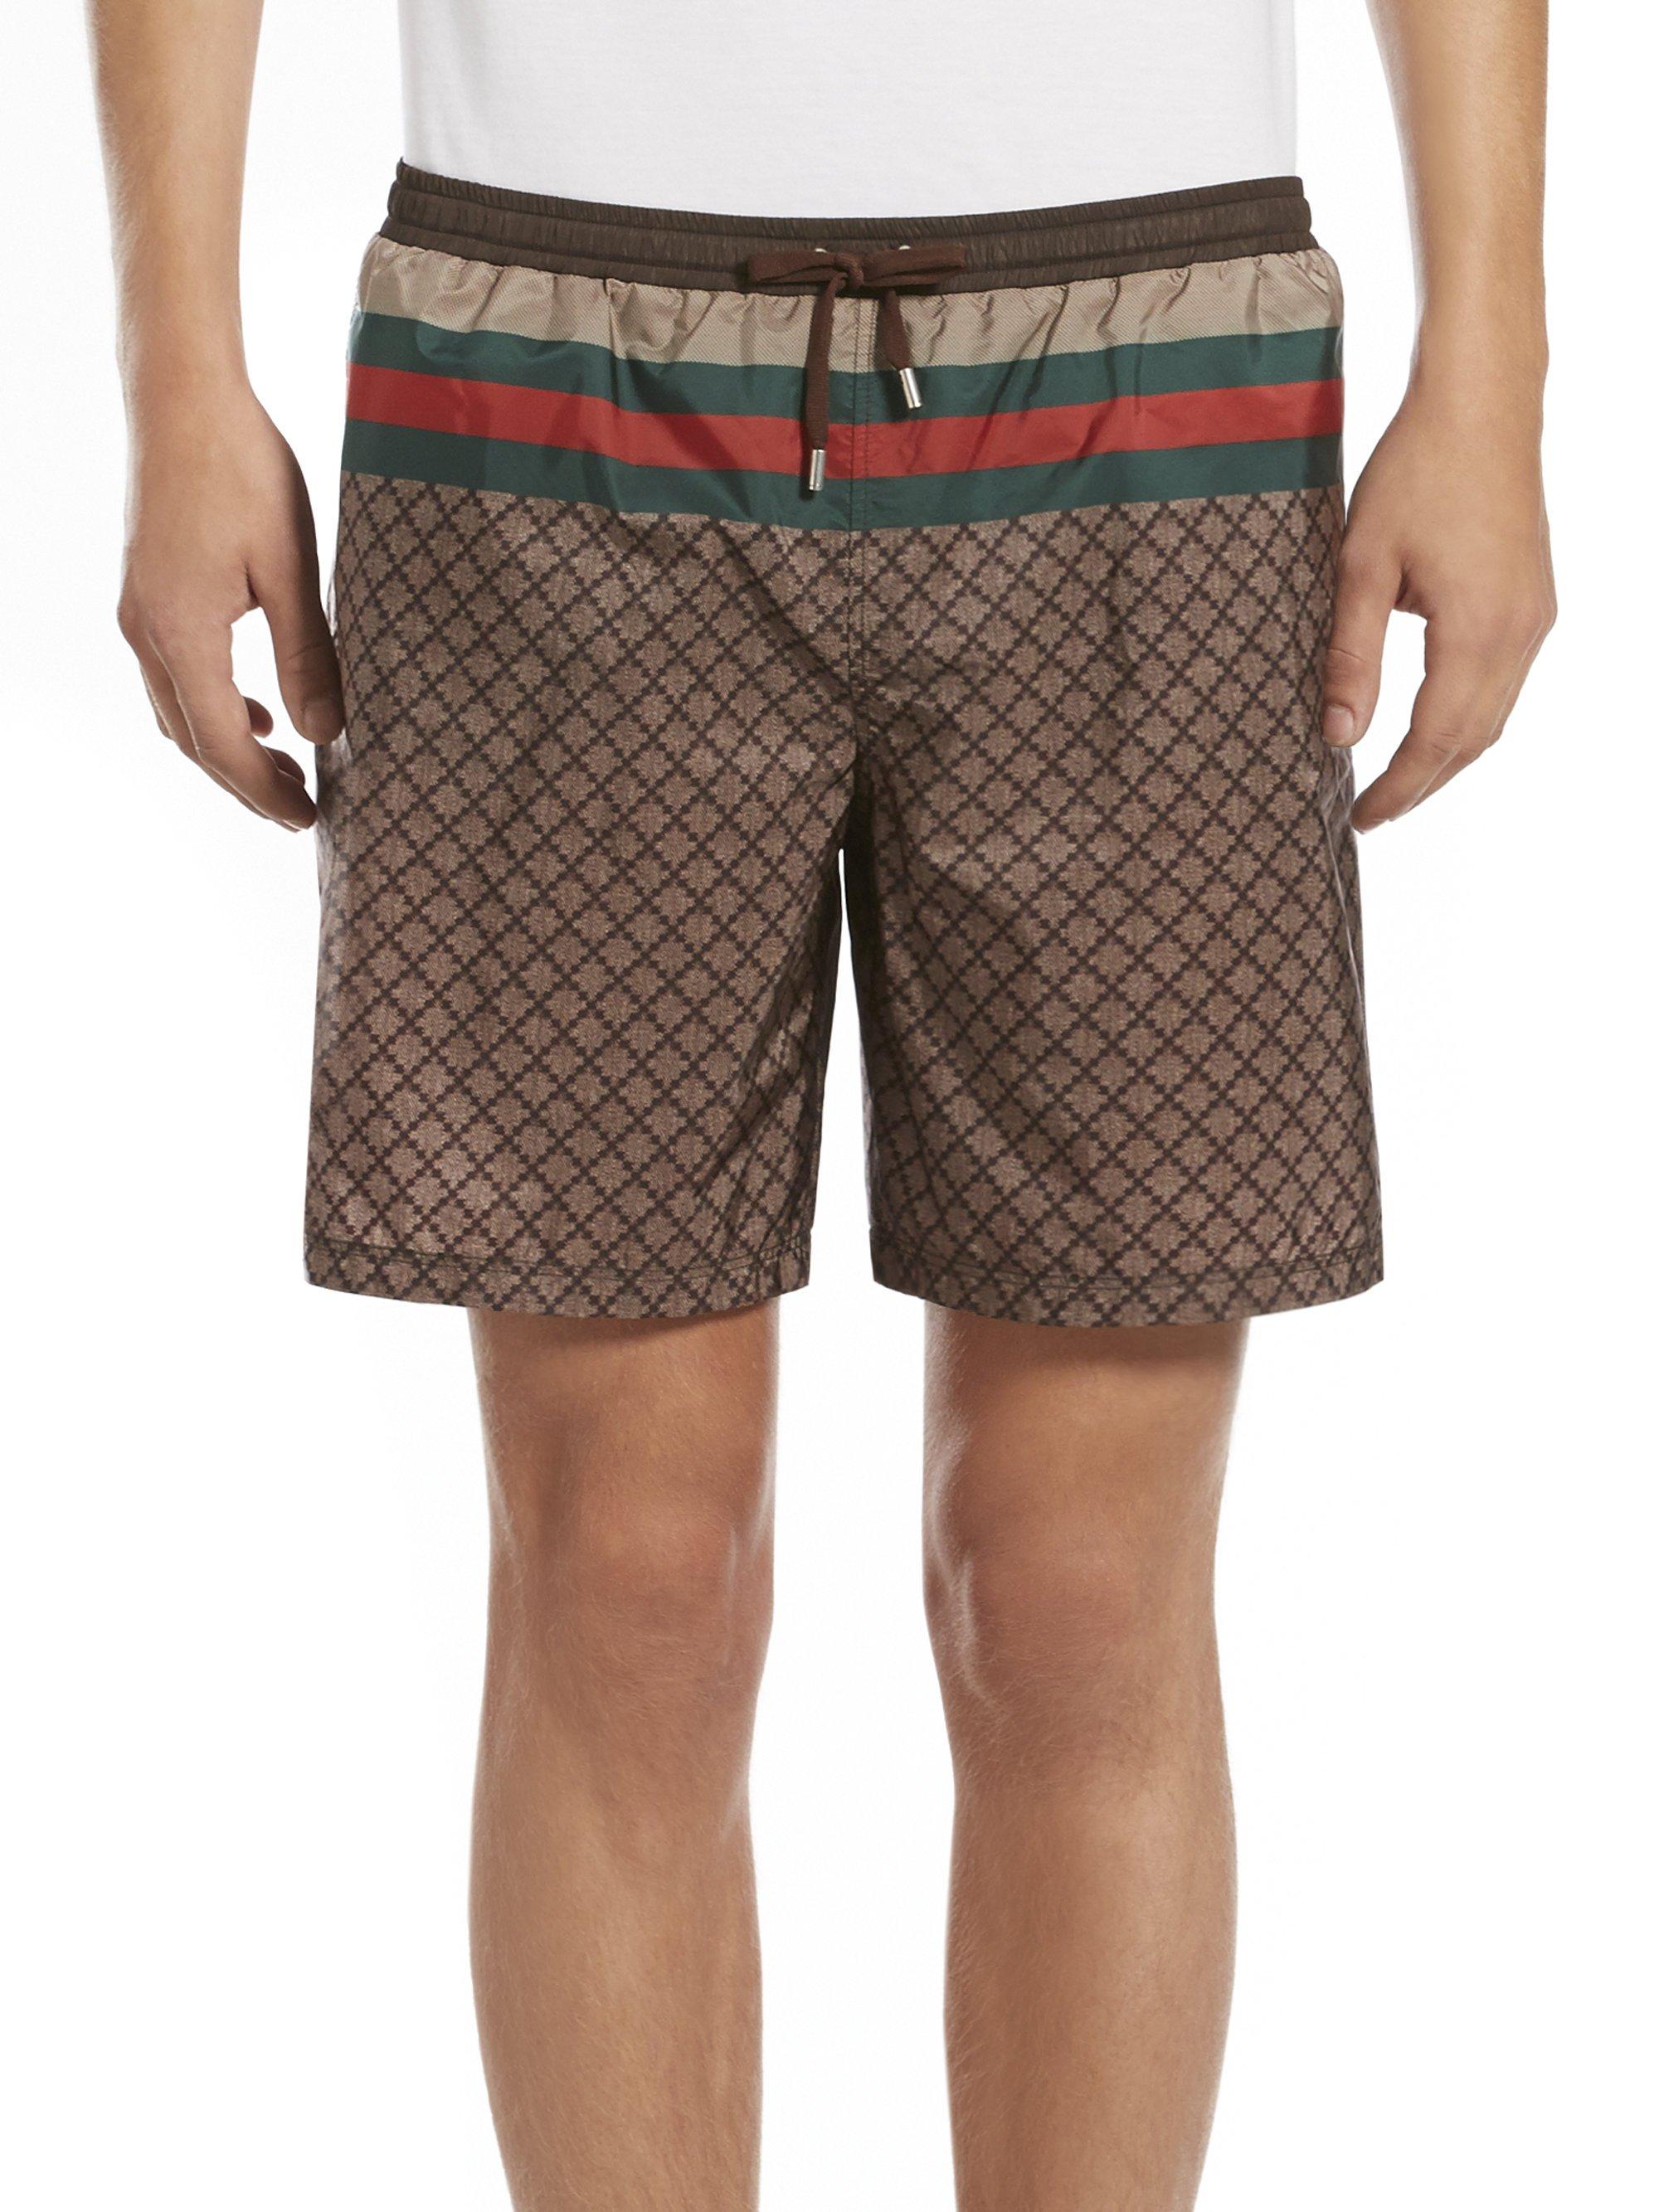 Mens Khaki Swim Shorts Hardon Clothes